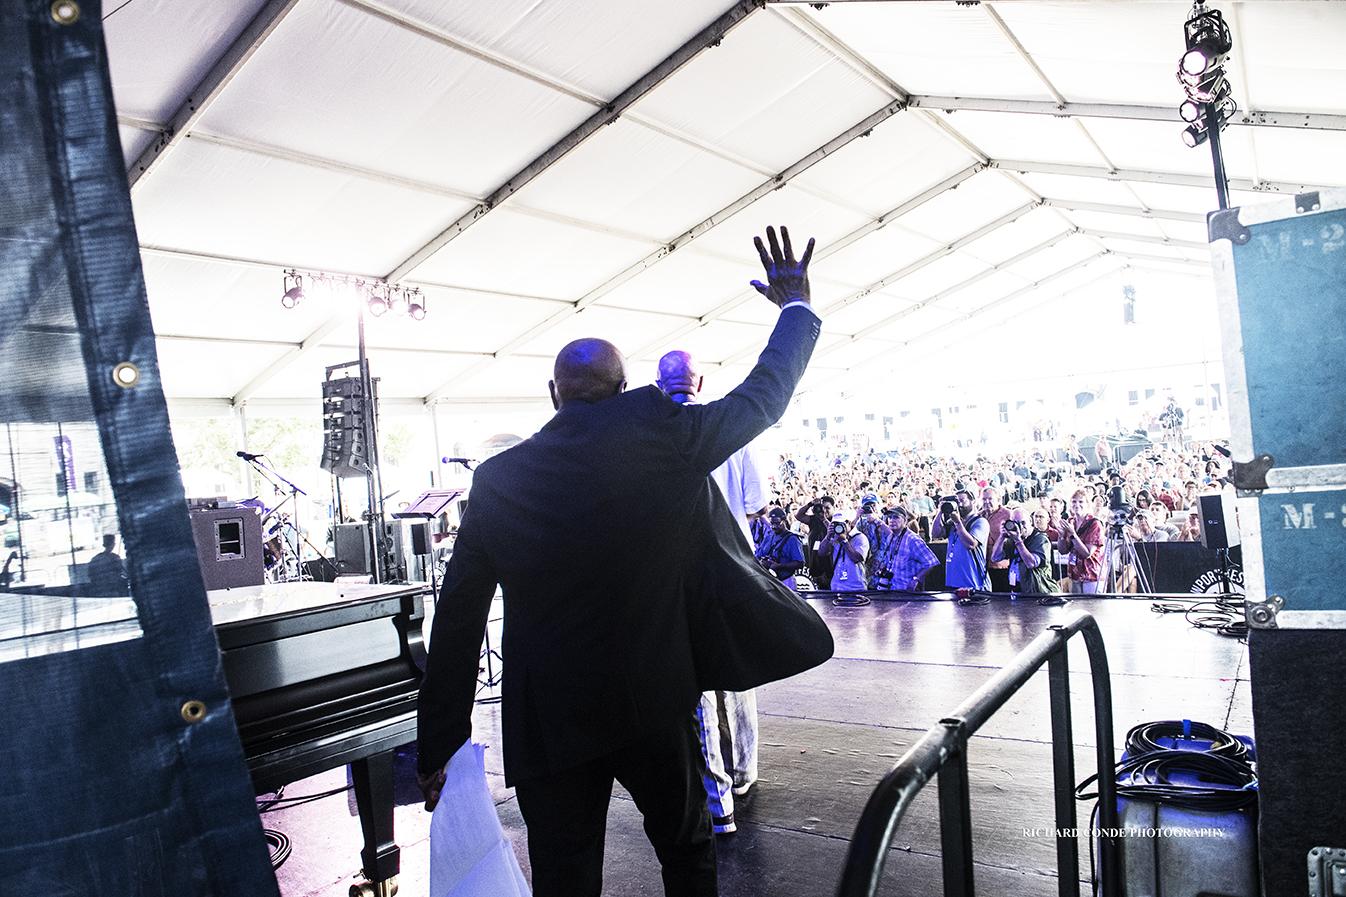 Trio 3 at the 2018 Newport Jazz Festival